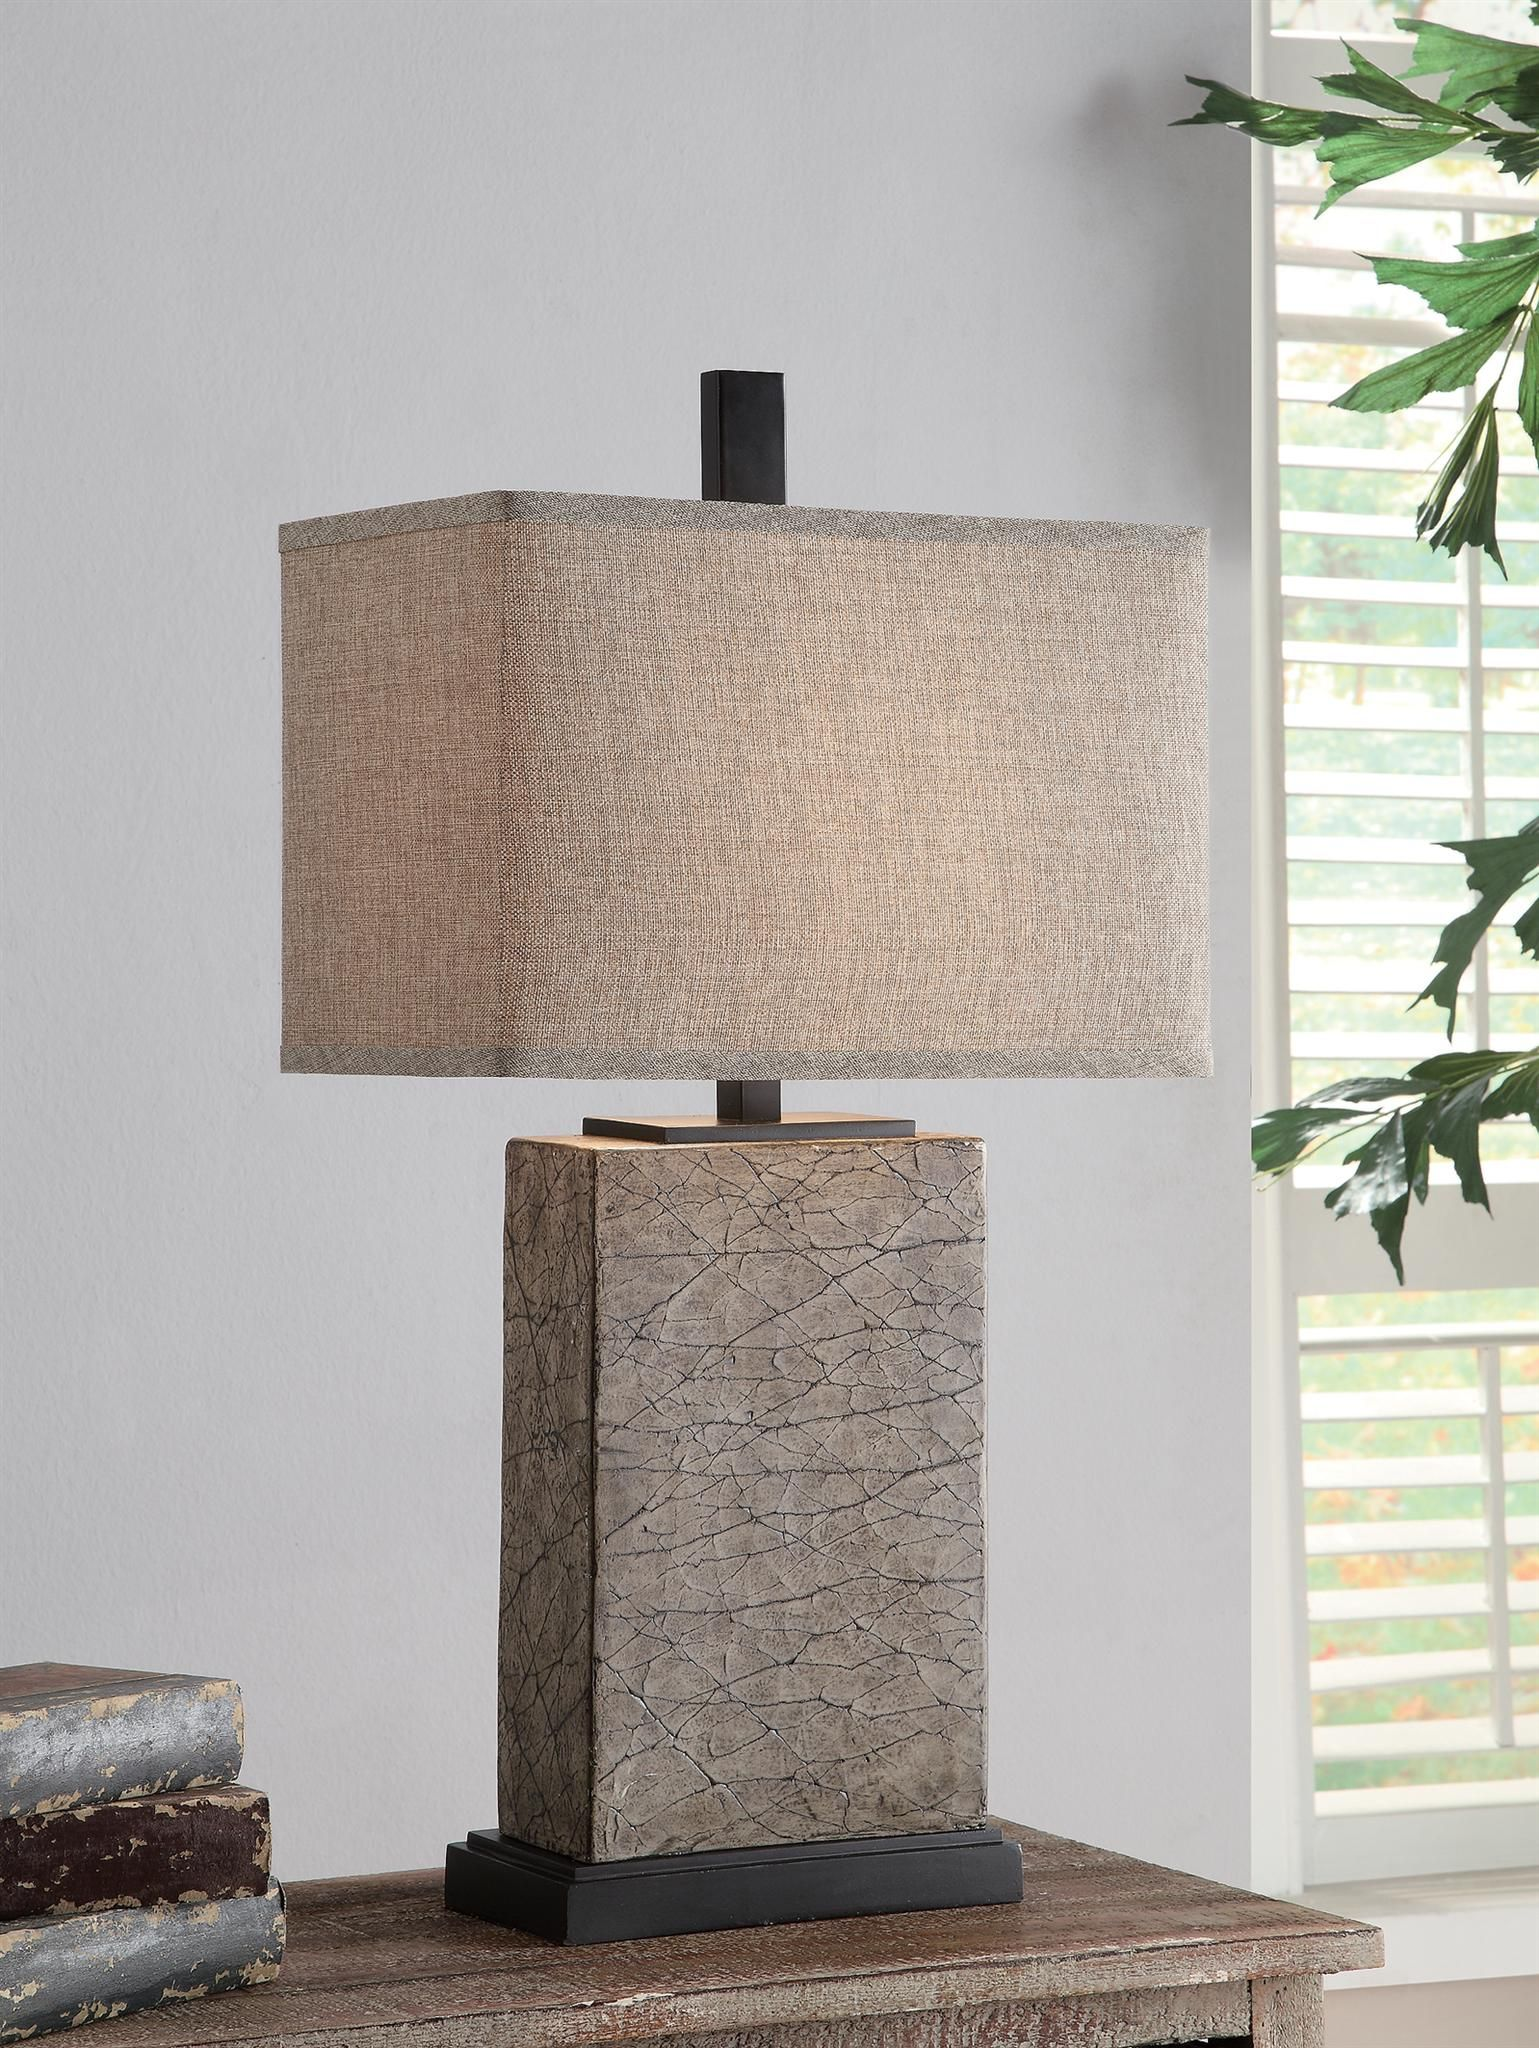 Mason Table Lamp 30 75 Ht Resin Crackled Gold Finish 9 5 16 X 9 5 16 X 11 Oatmeal Linen Shade 30 75 Ht Rectangular Lamp Table Lamp Lamp